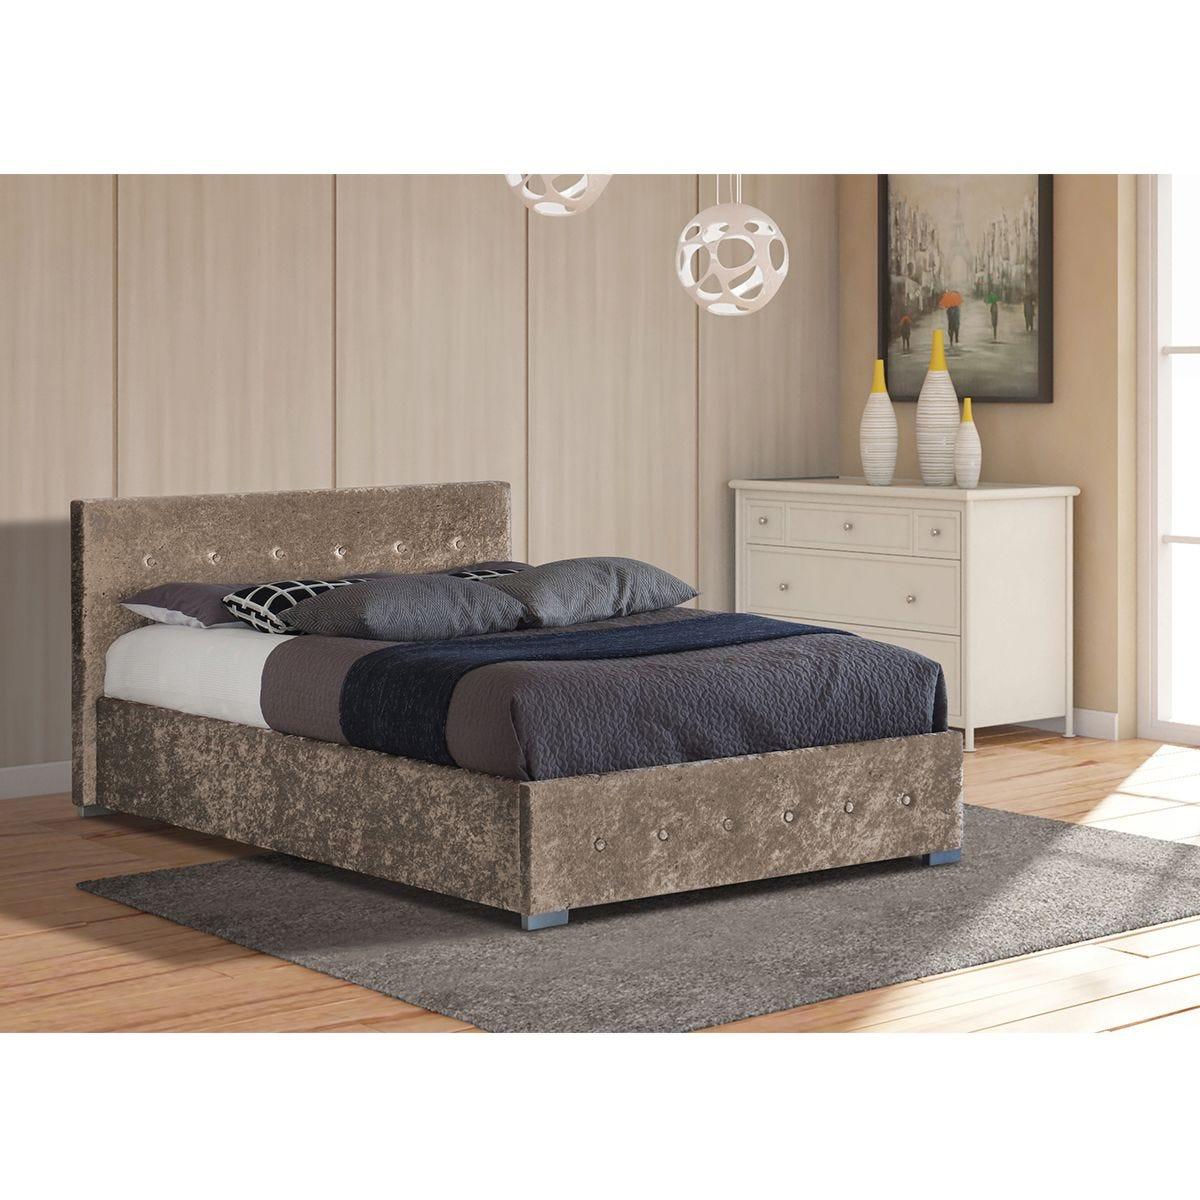 Albie Ottoman King Storage Bed - Truffle